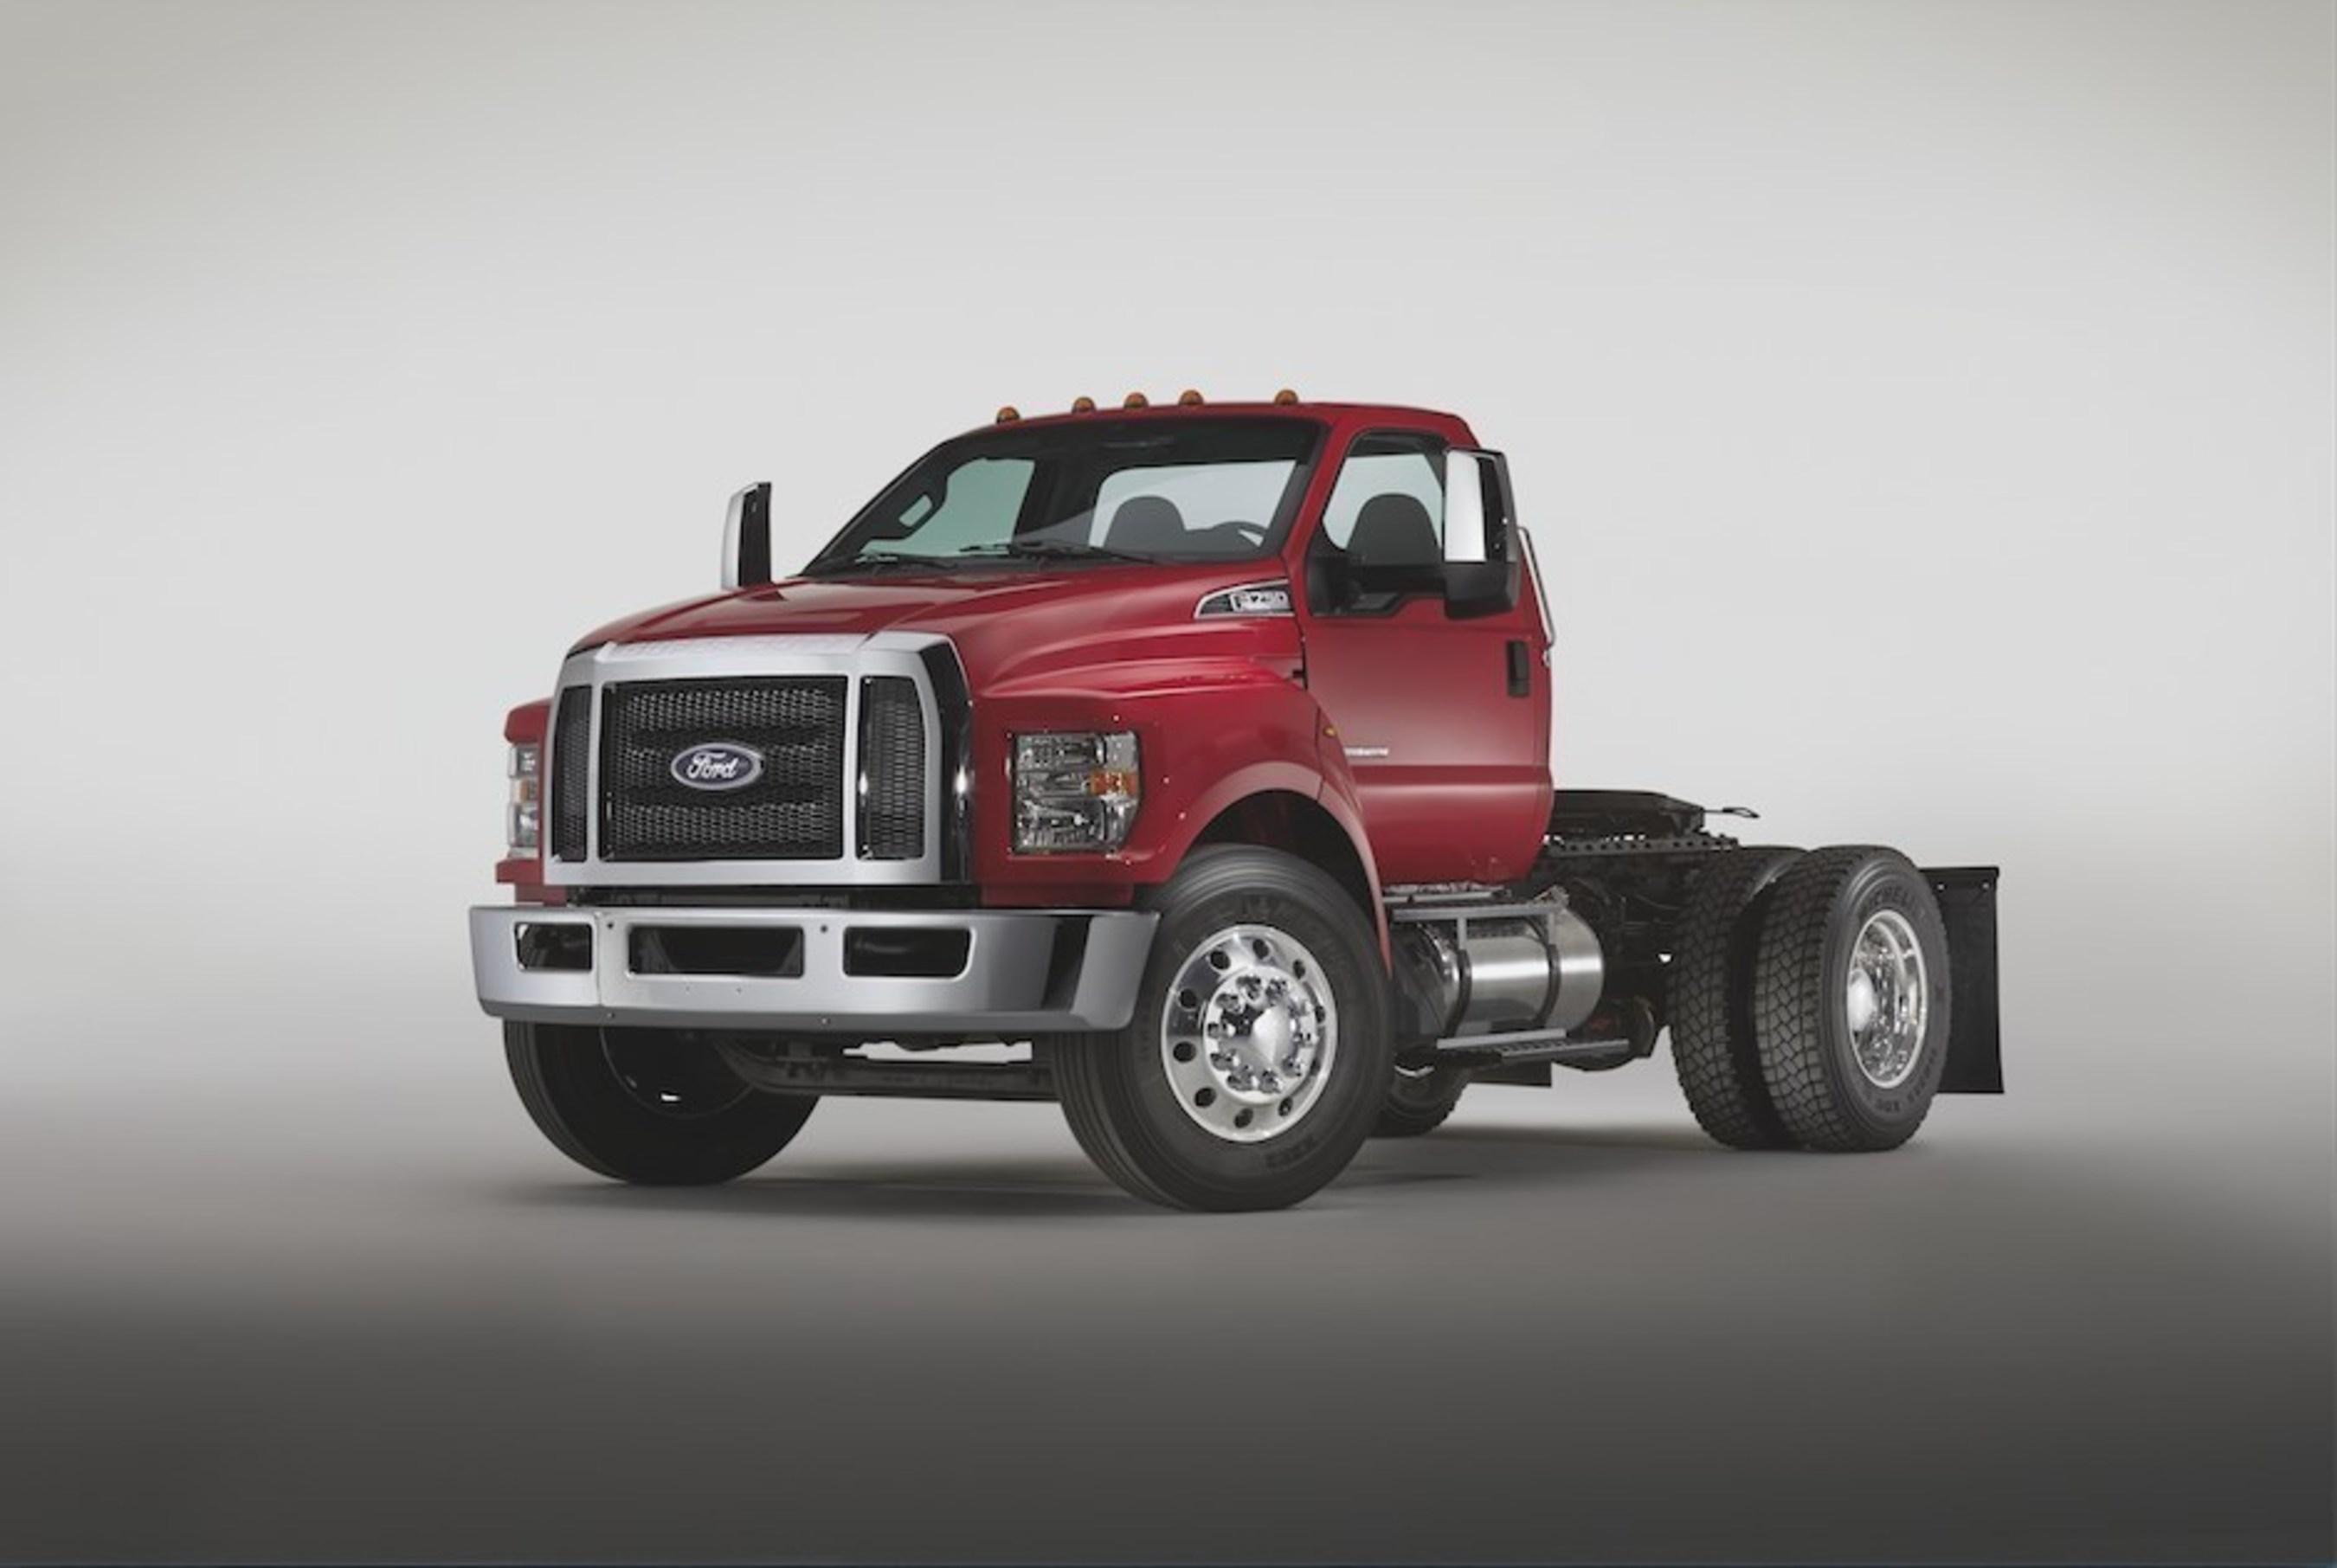 Fontaine Opens New Truck Modification Center in Avon Lake, Ohio